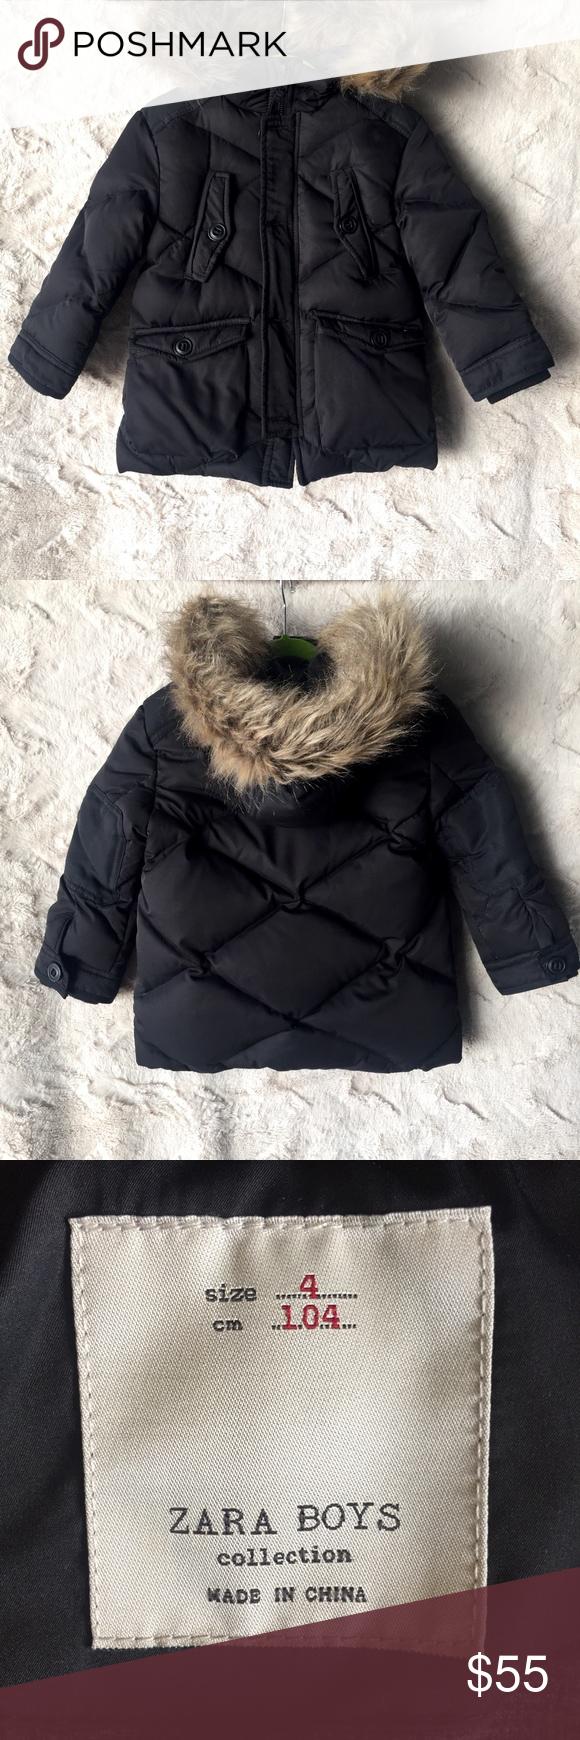 Zara Boys Hooded Down Puffer Jacket 4t Zara Boys Zara Puffer Jackets [ 1740 x 580 Pixel ]